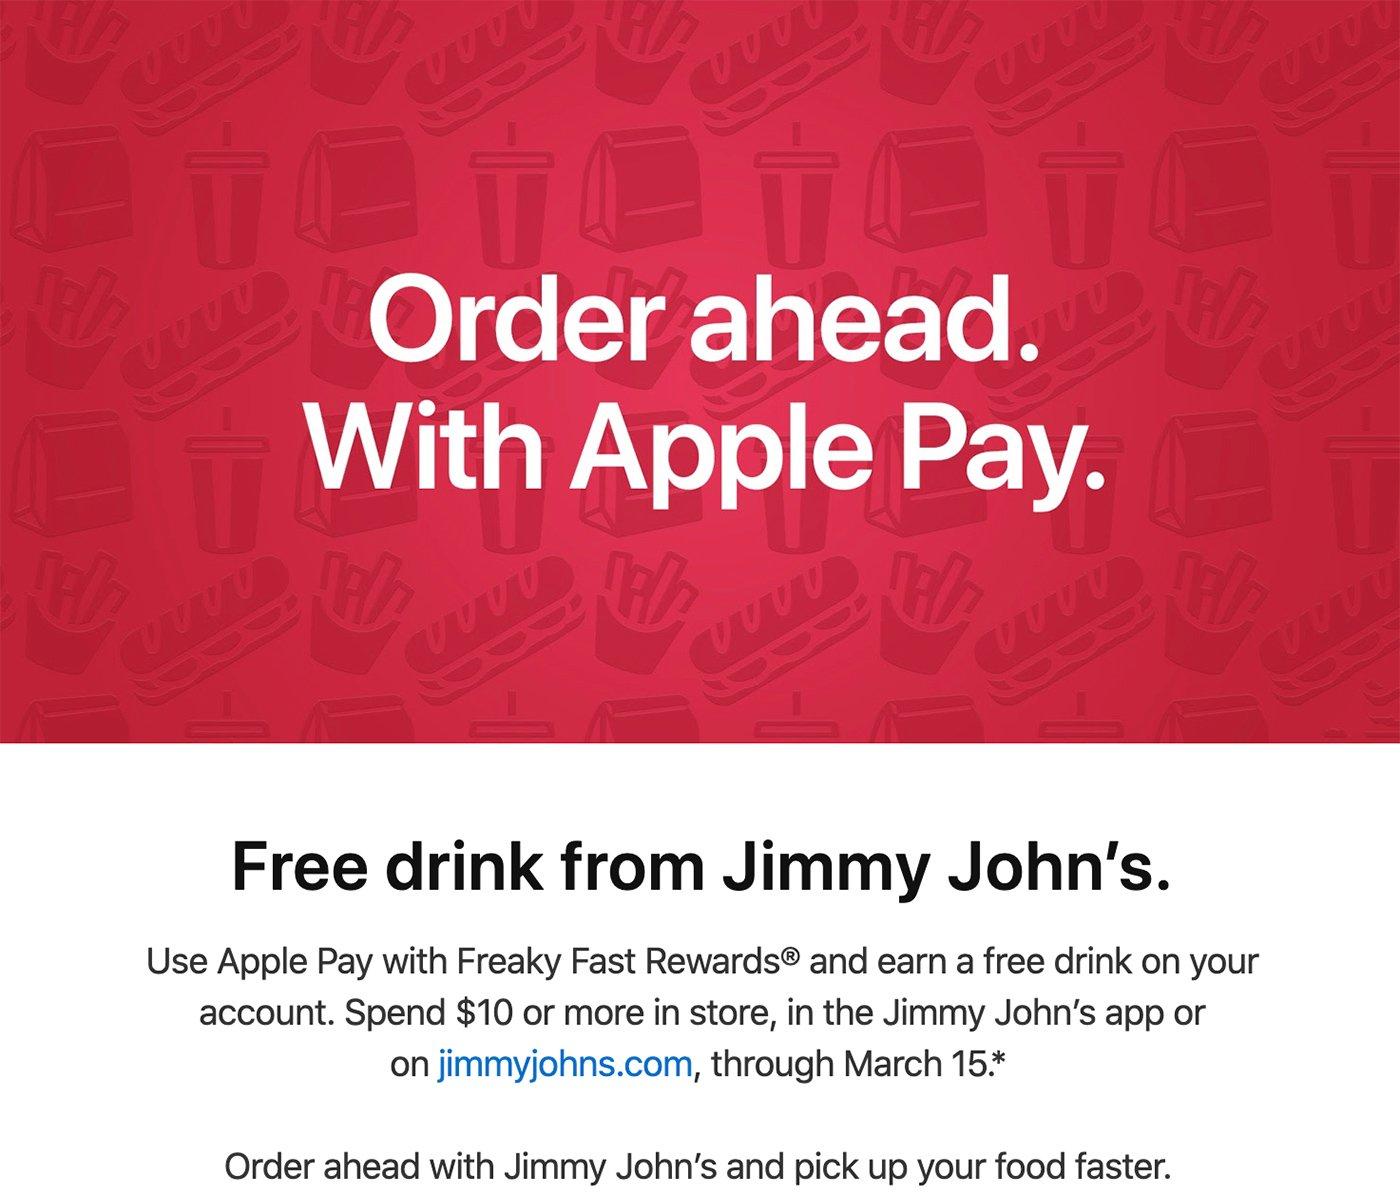 Order Resume Online Little Caesars - Krispy Kreme Careers